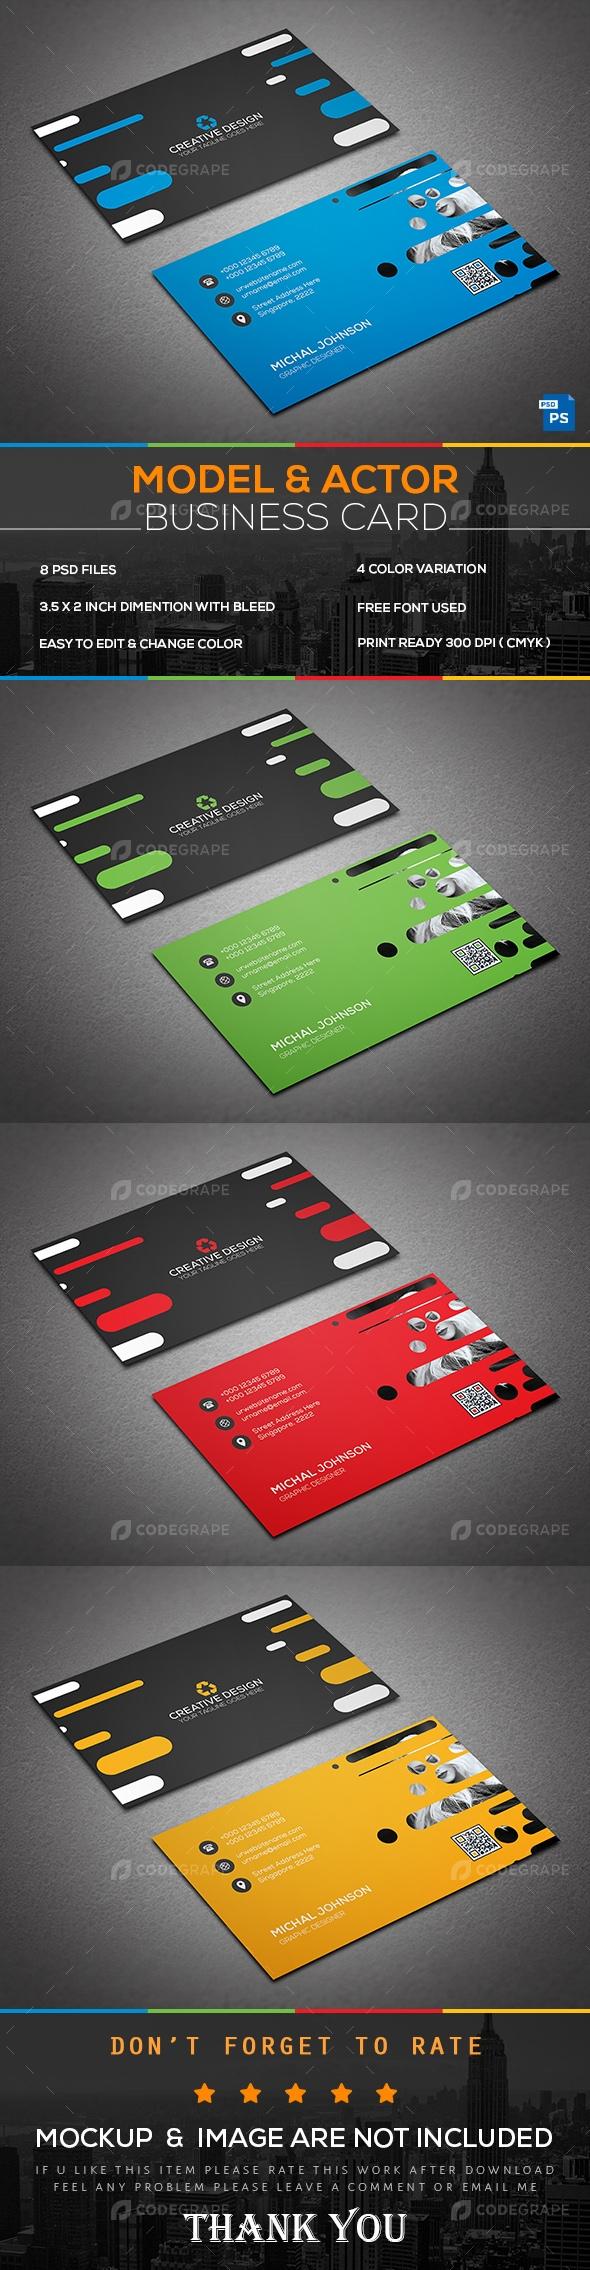 Model actor business card print codegrape model actor business card magicingreecefo Choice Image